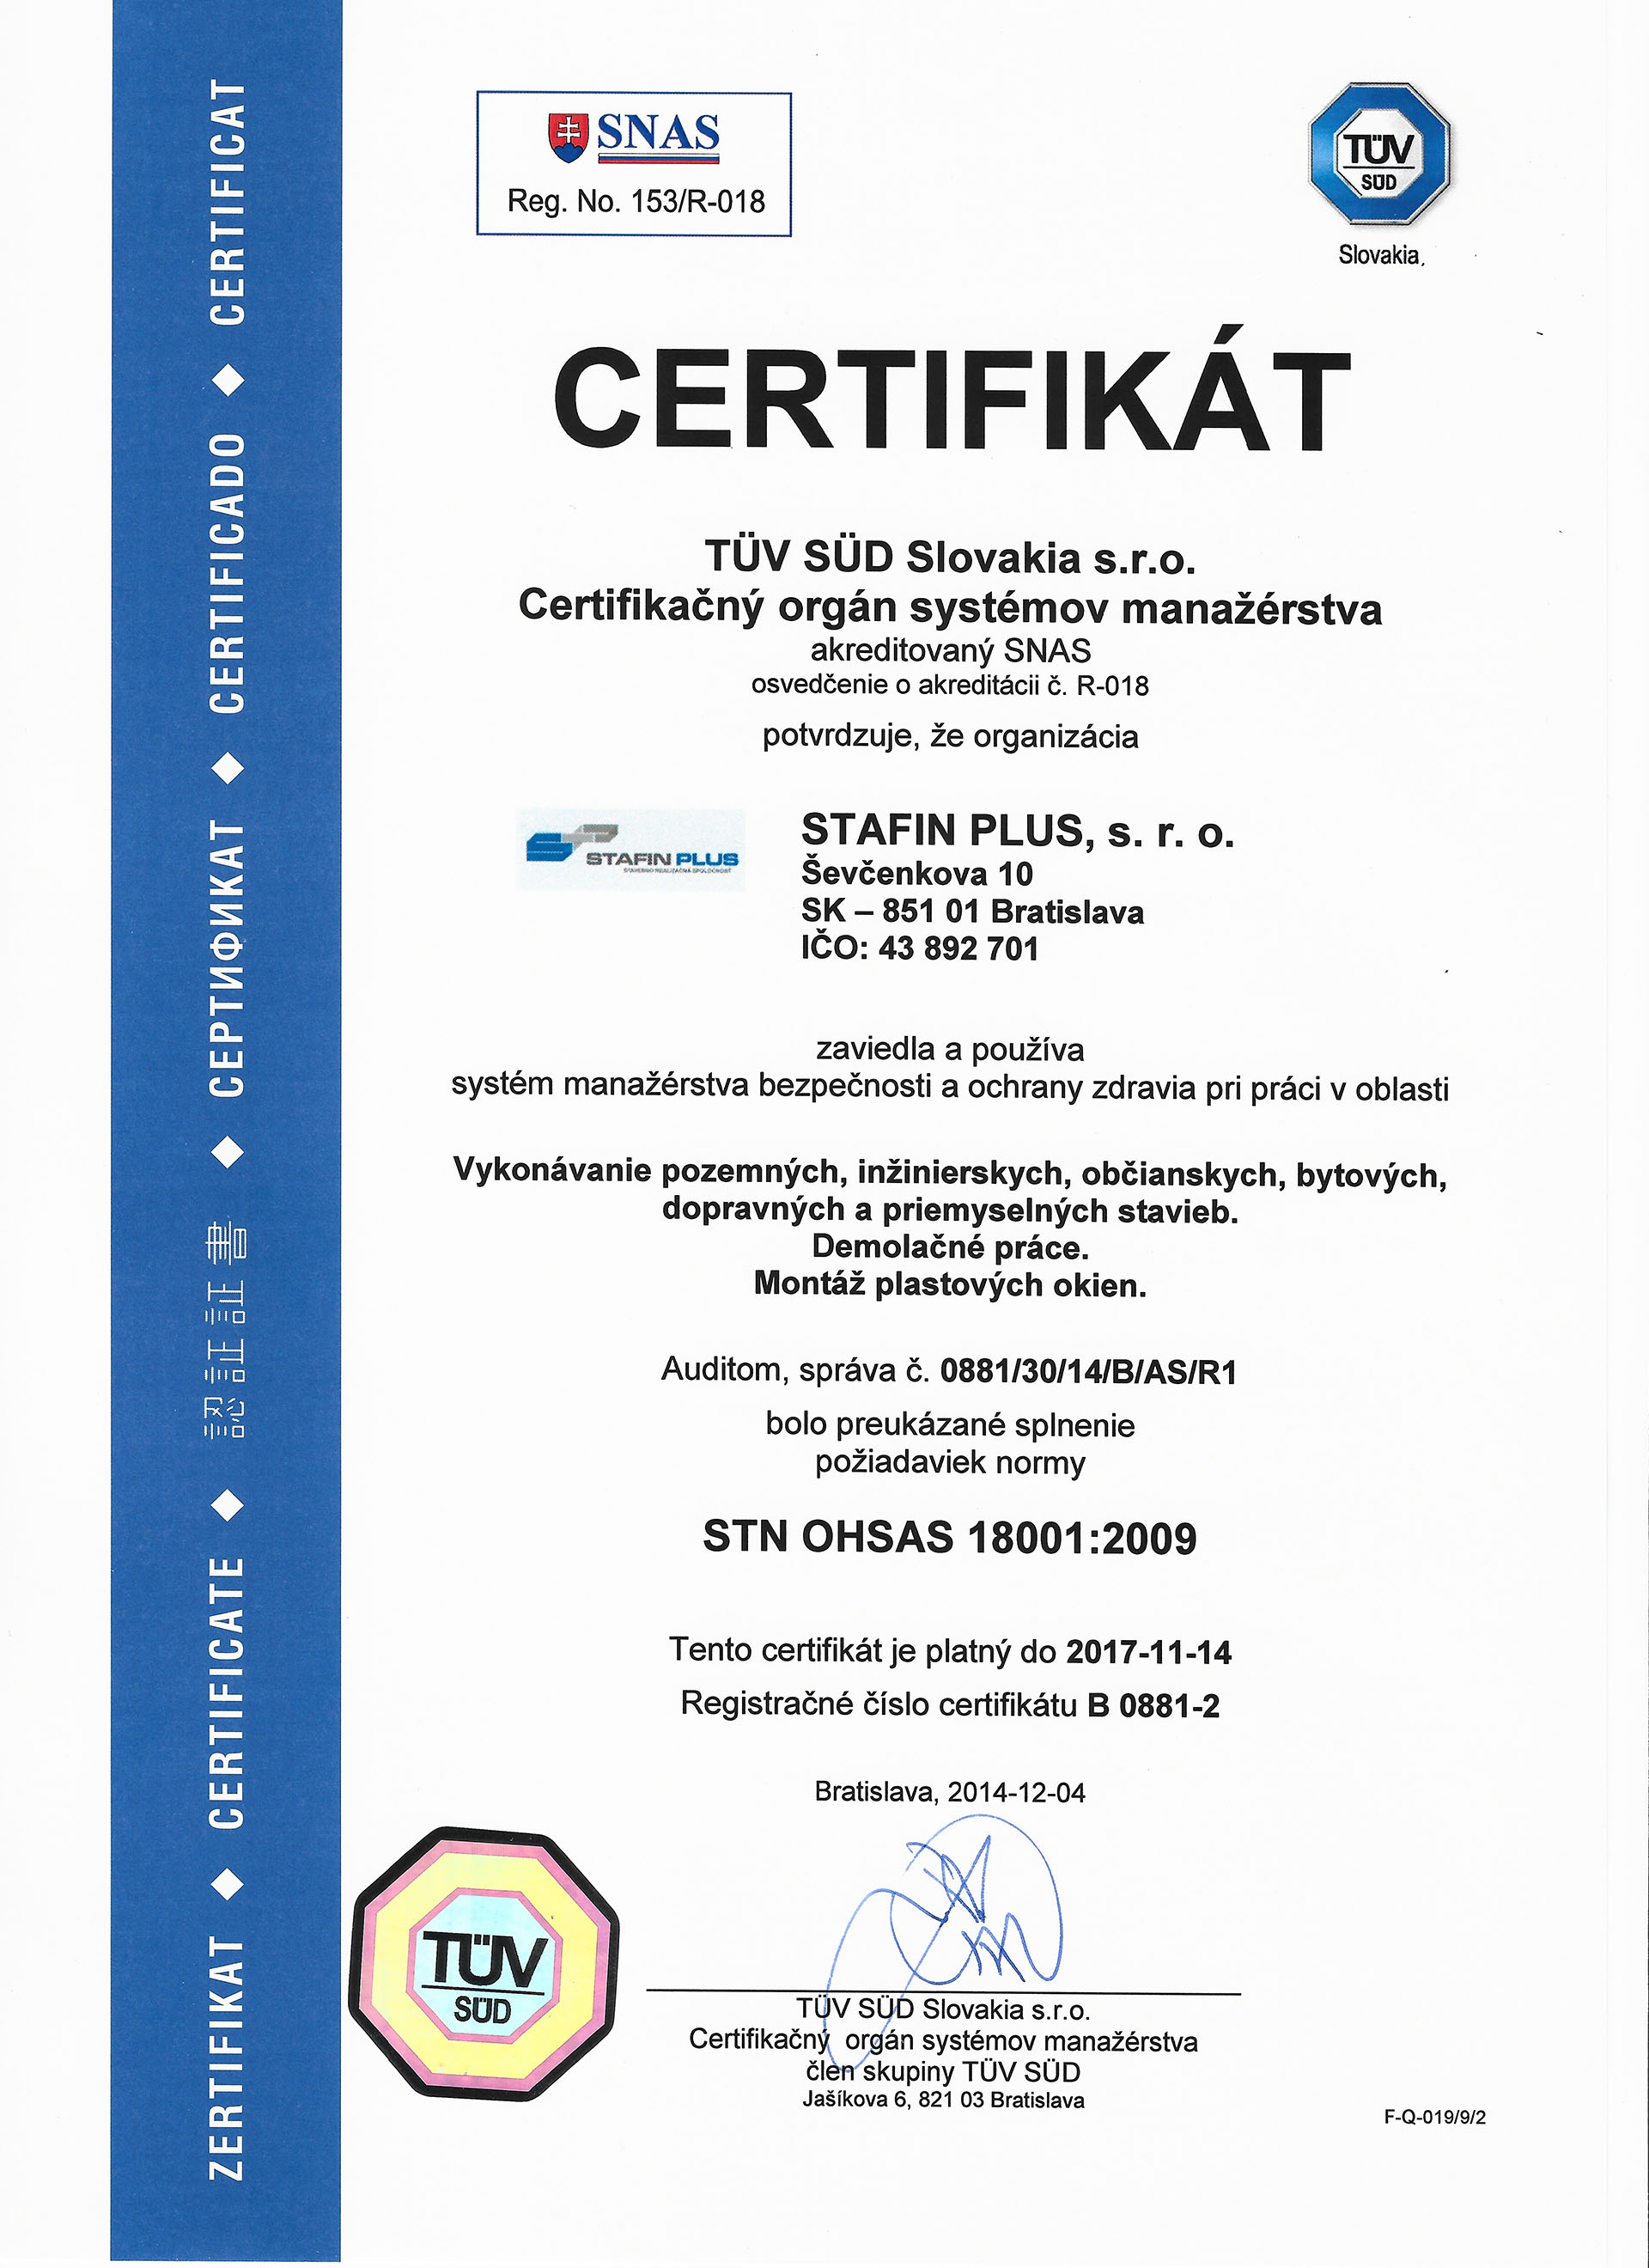 Certifikát STN OHSAS 18001